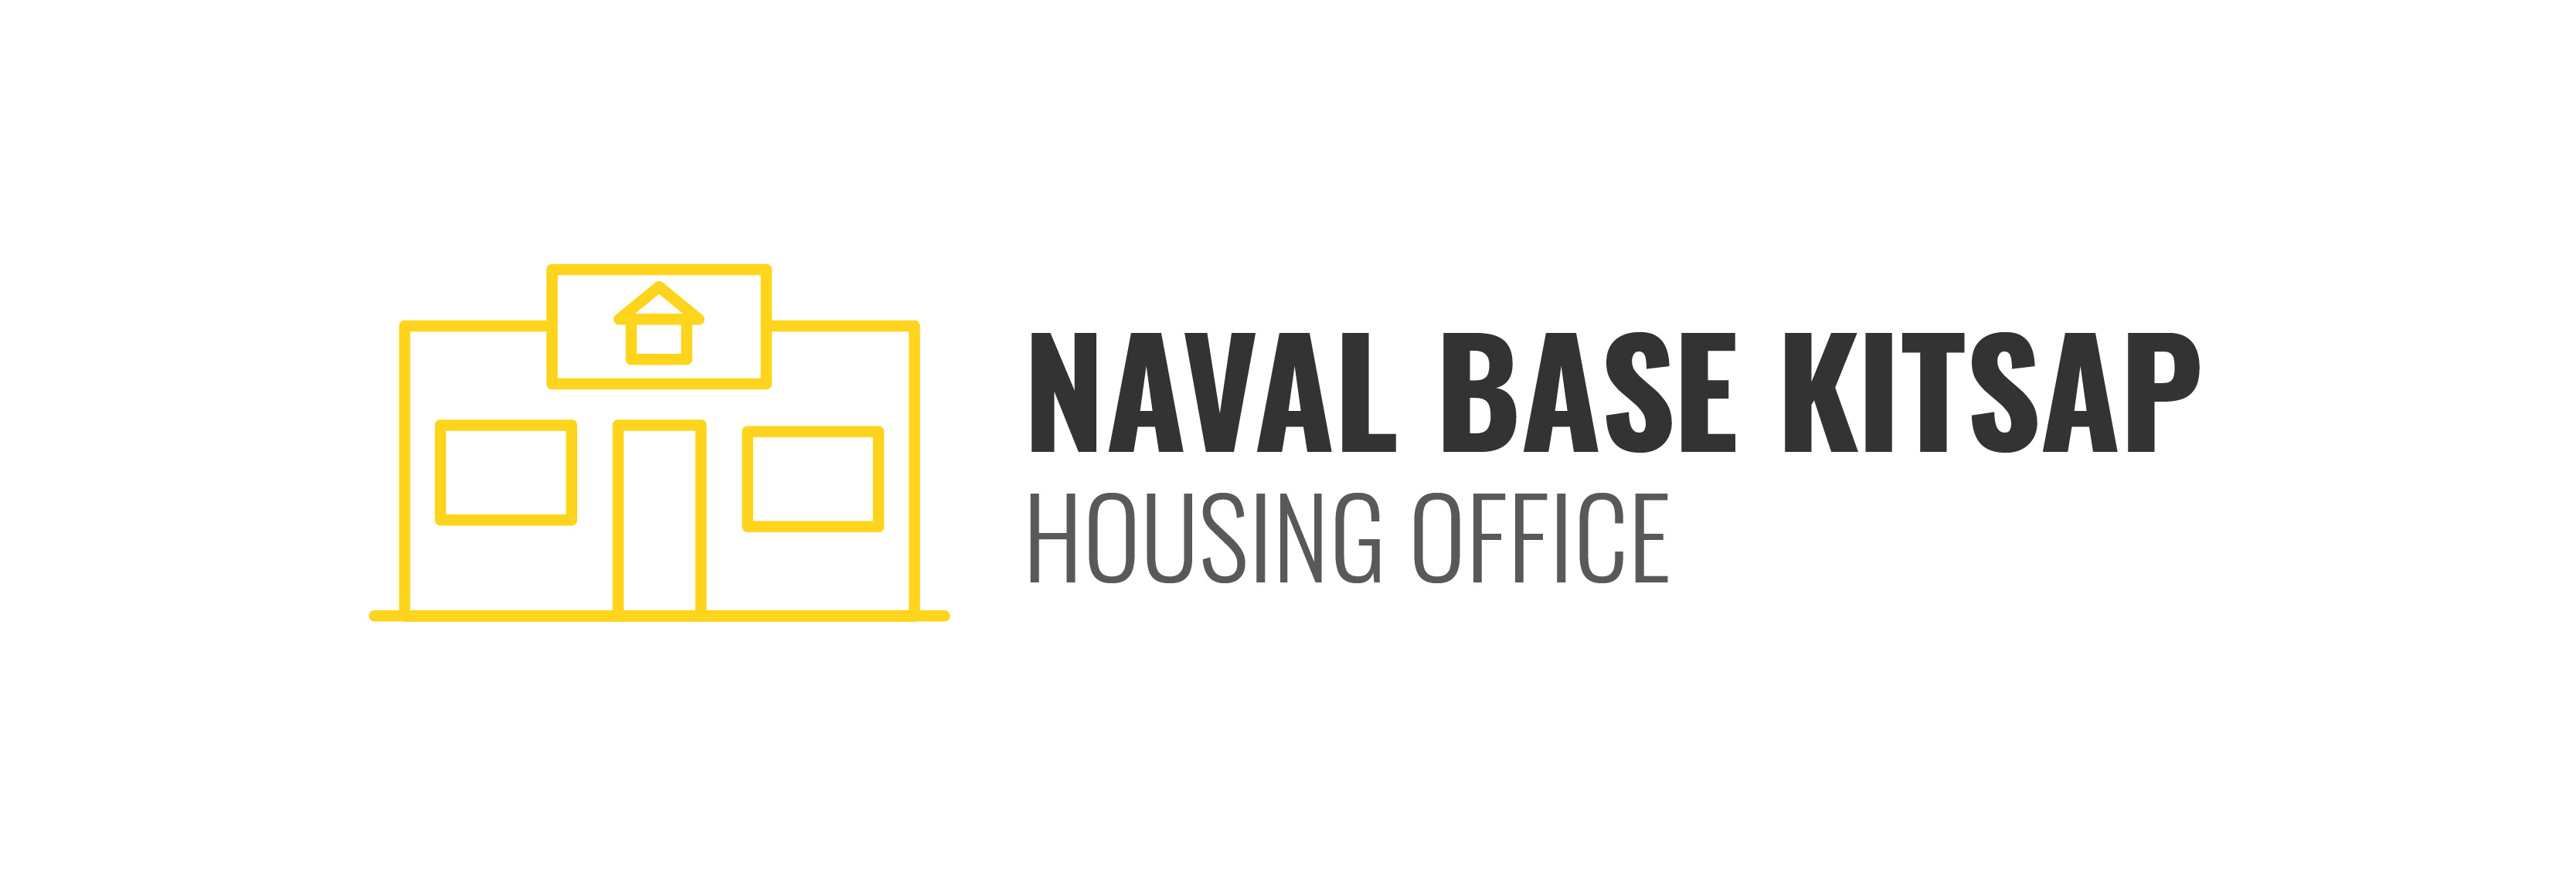 Naval Base Kitsap Housing Office